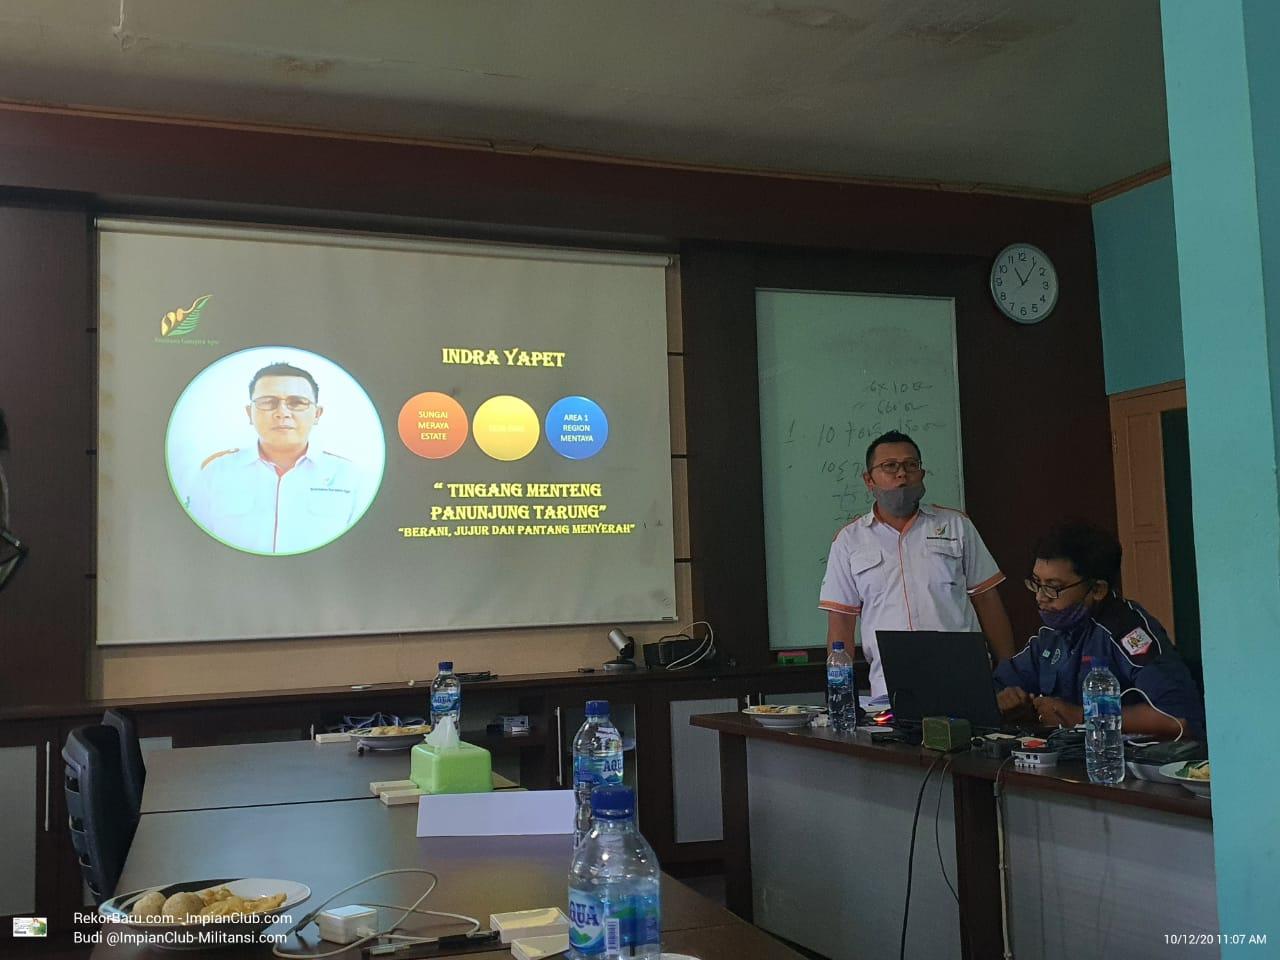 Presenter V, Bapak Indra Yapet, EM SMRE